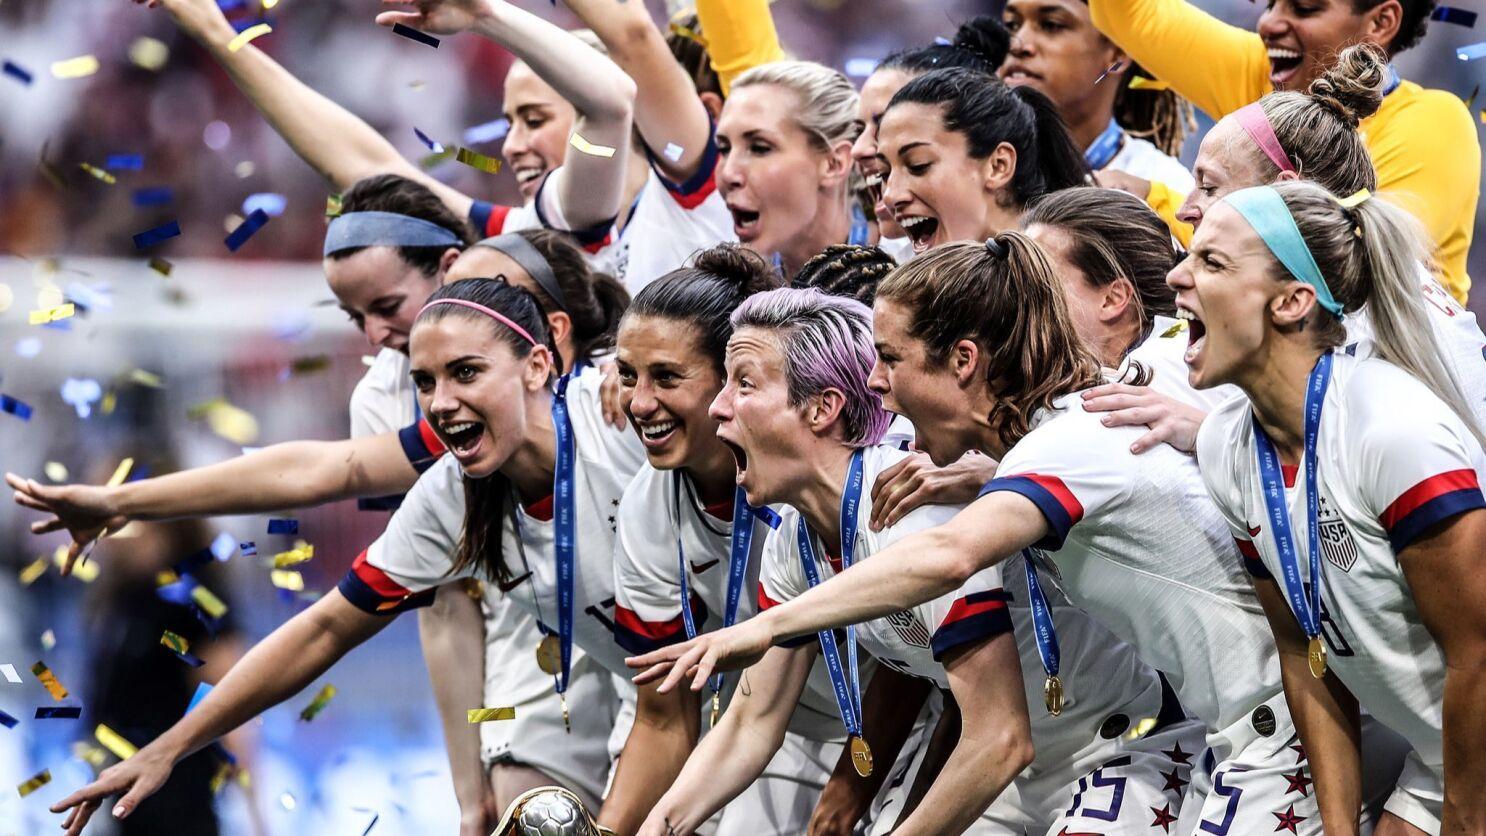 United States women's national soccer team